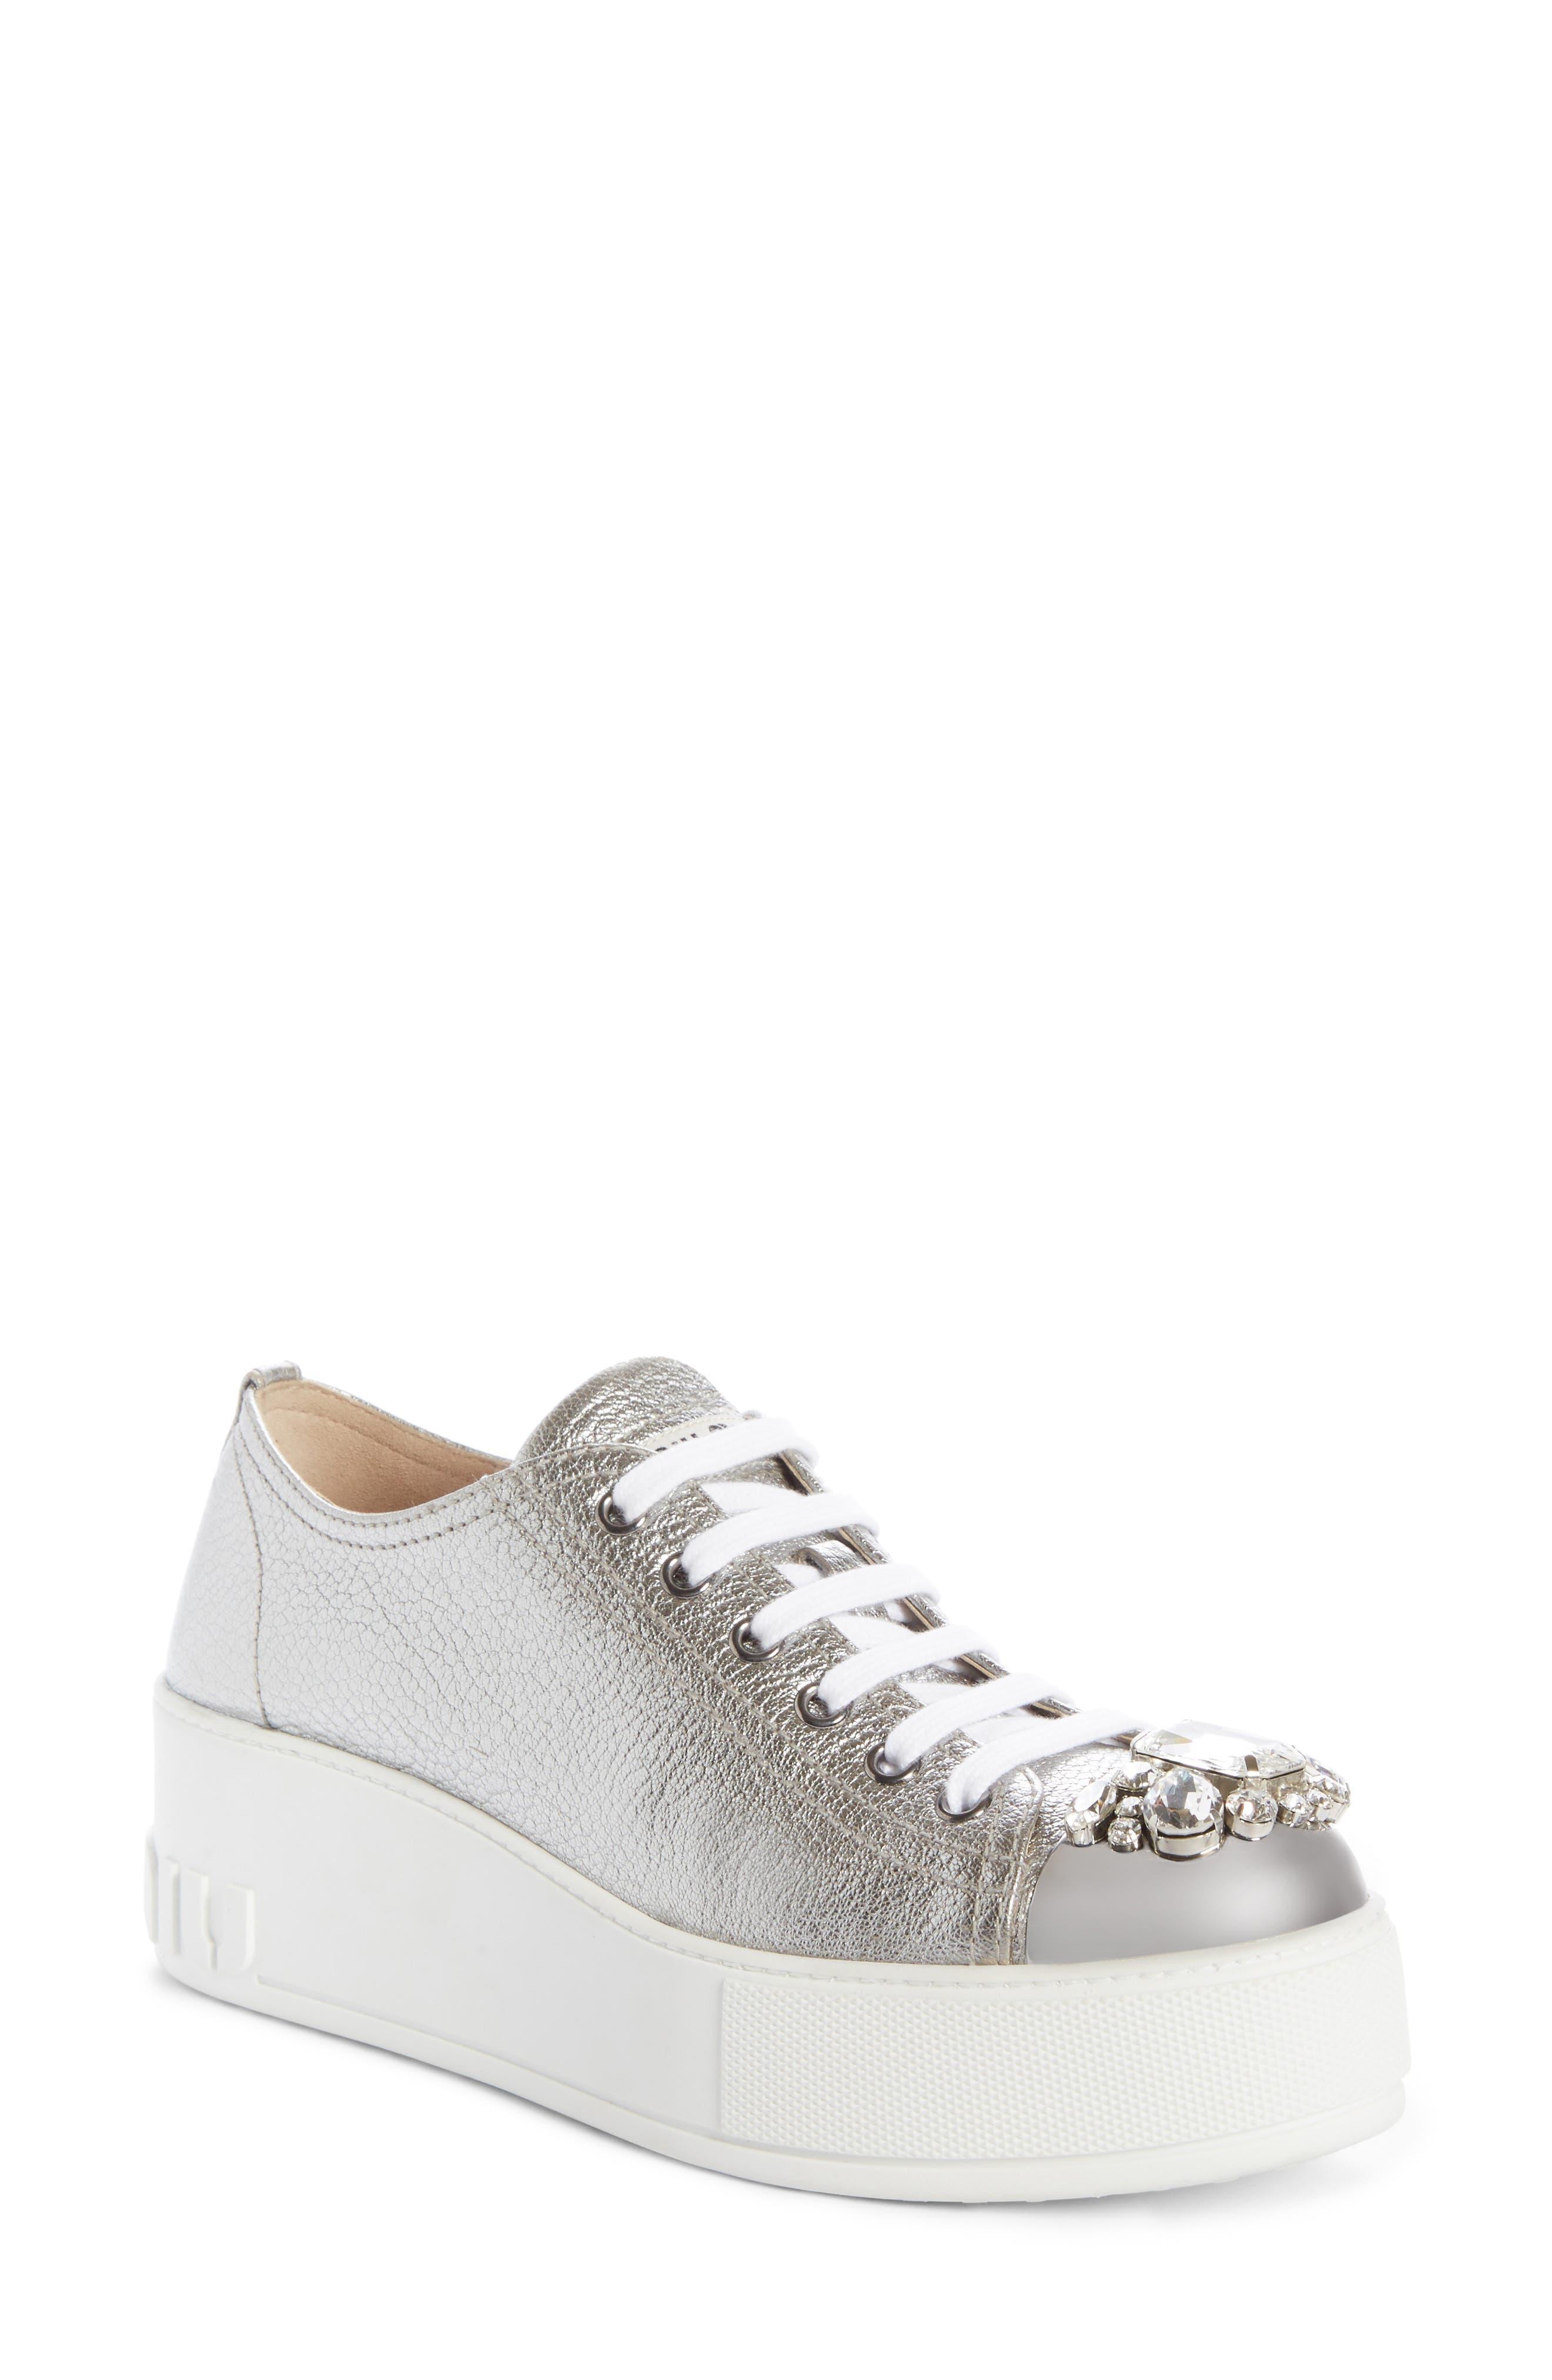 Crystal Cap Toe Sneaker,                         Main,                         color, SILVER